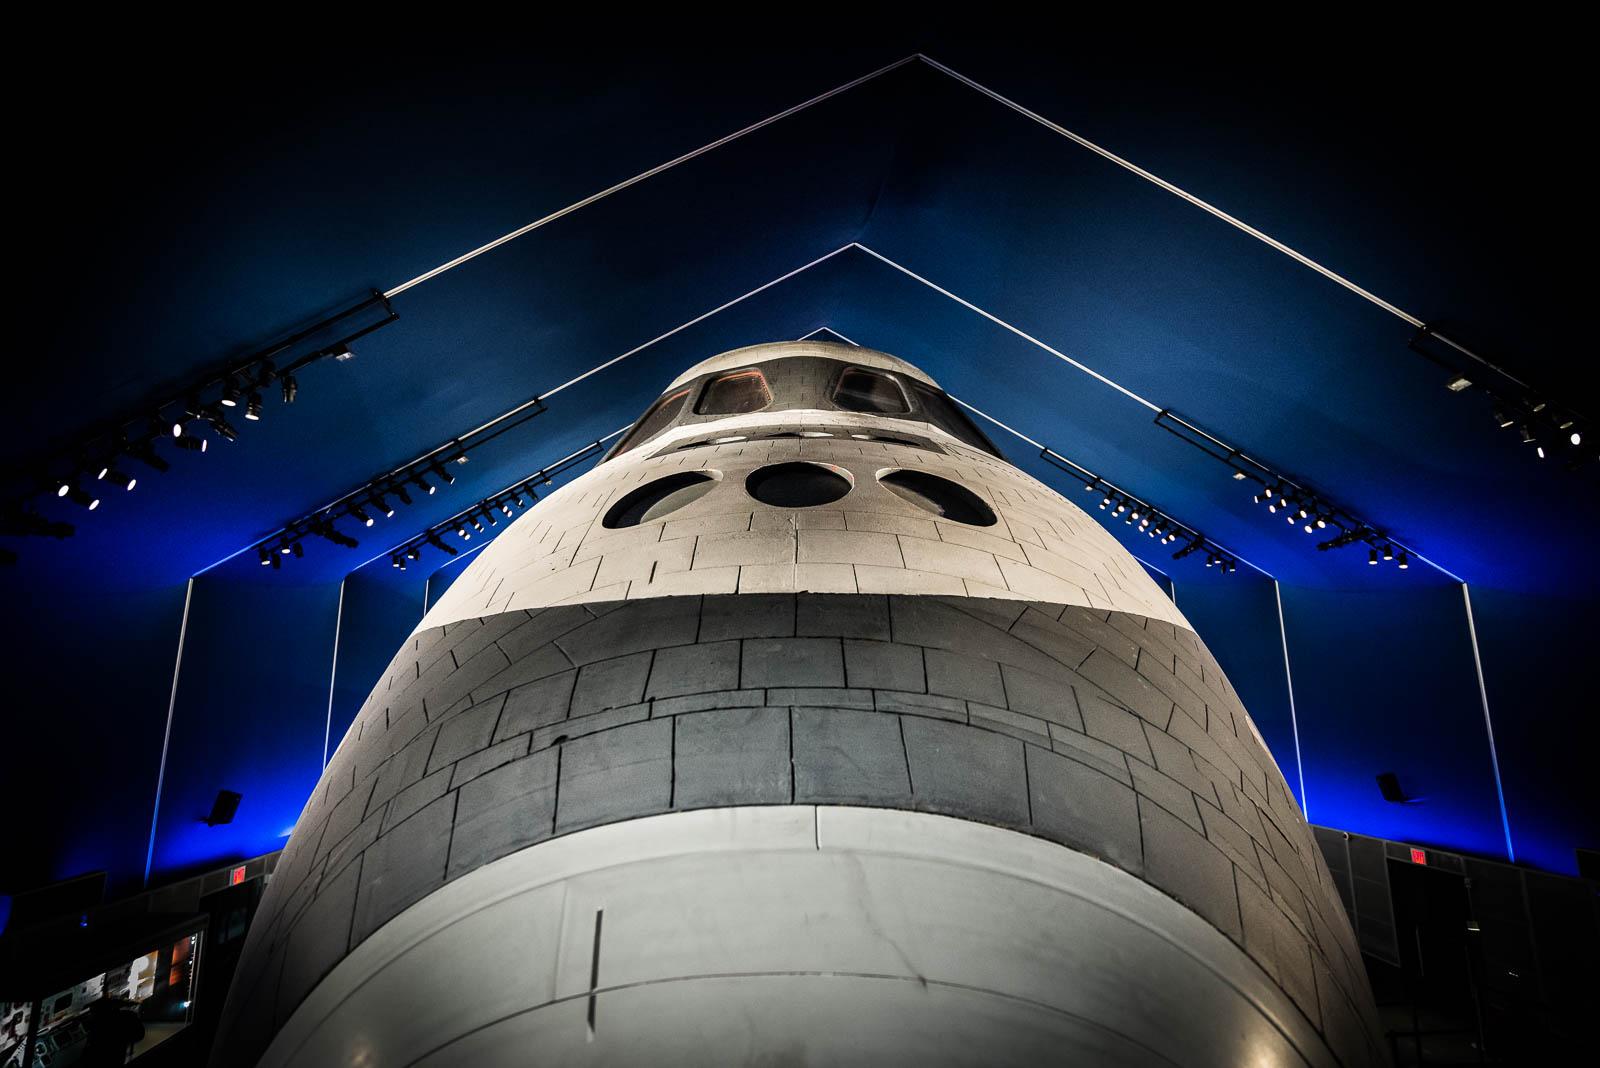 New York City Space Shuttle 2